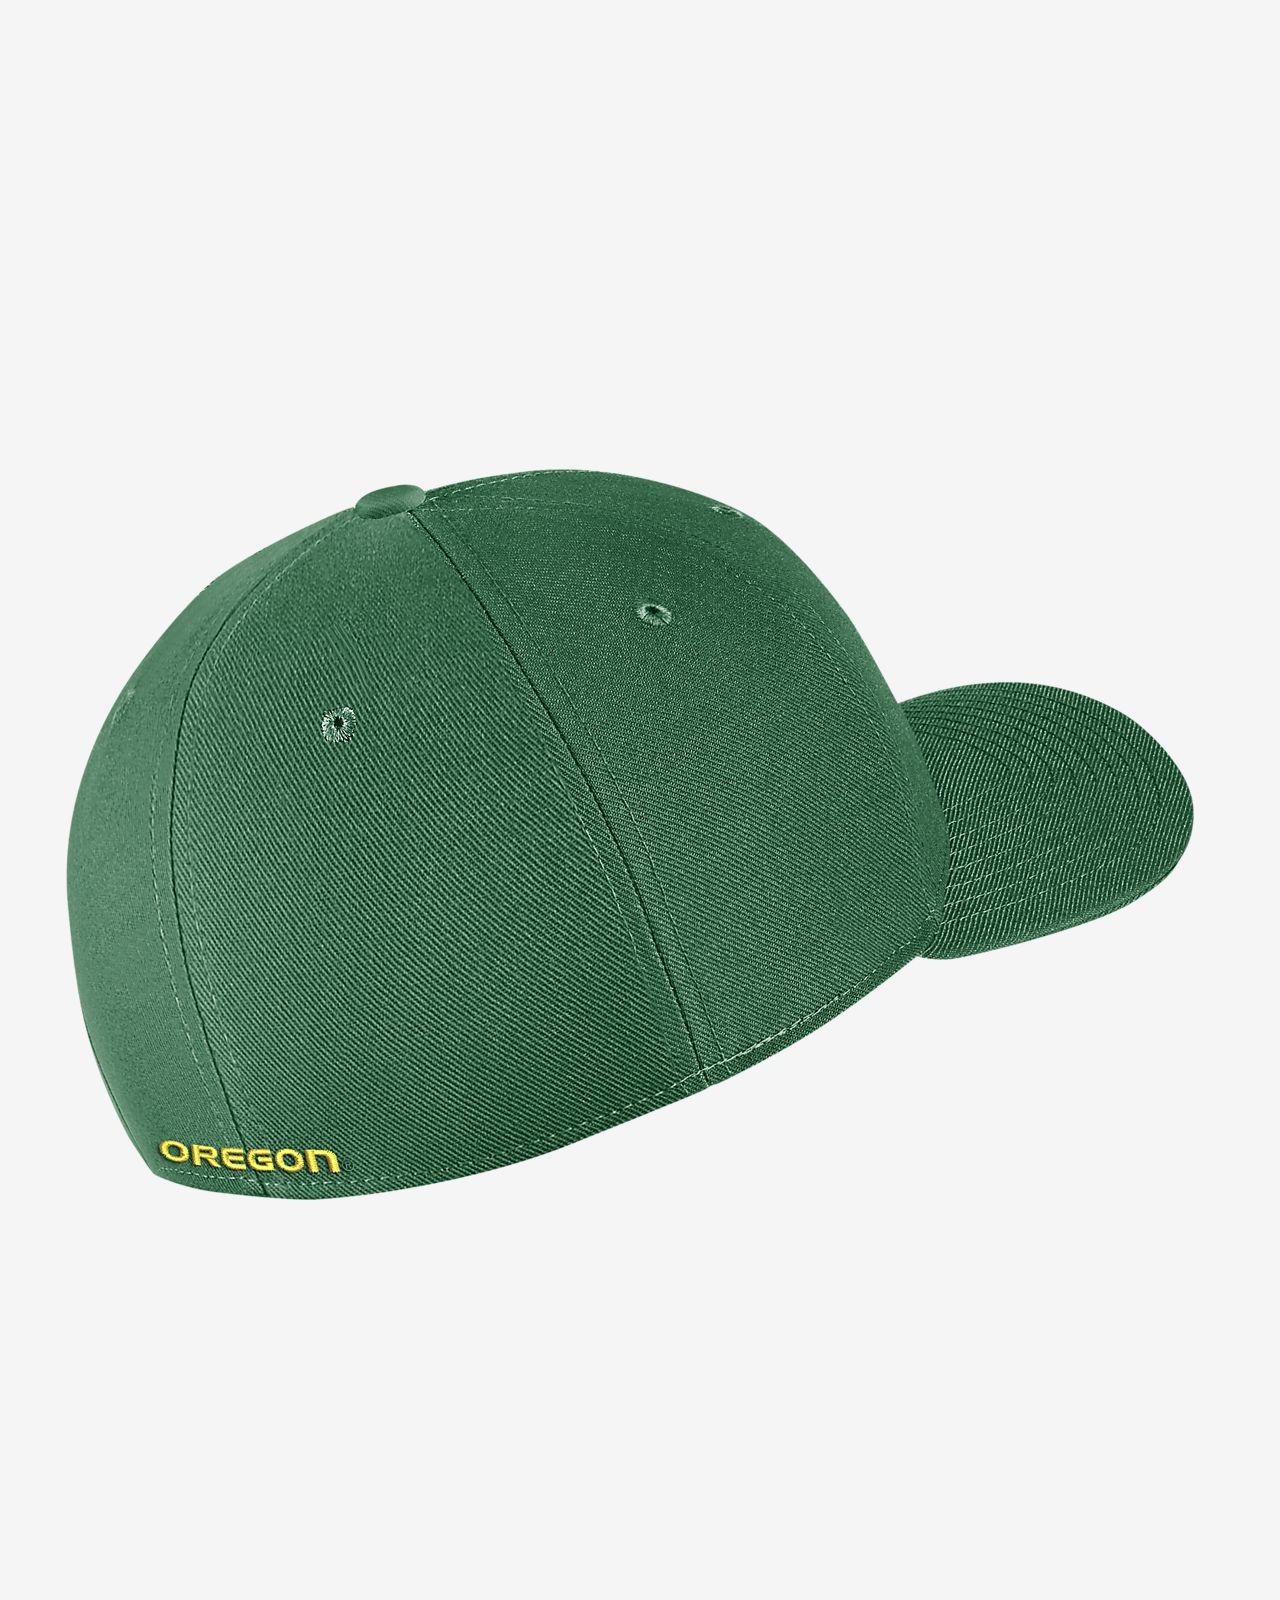 3827161d6b00 Nike College Dri-FIT Classic99 Swoosh Flex (Oregon) Fitted Hat. Nike.com